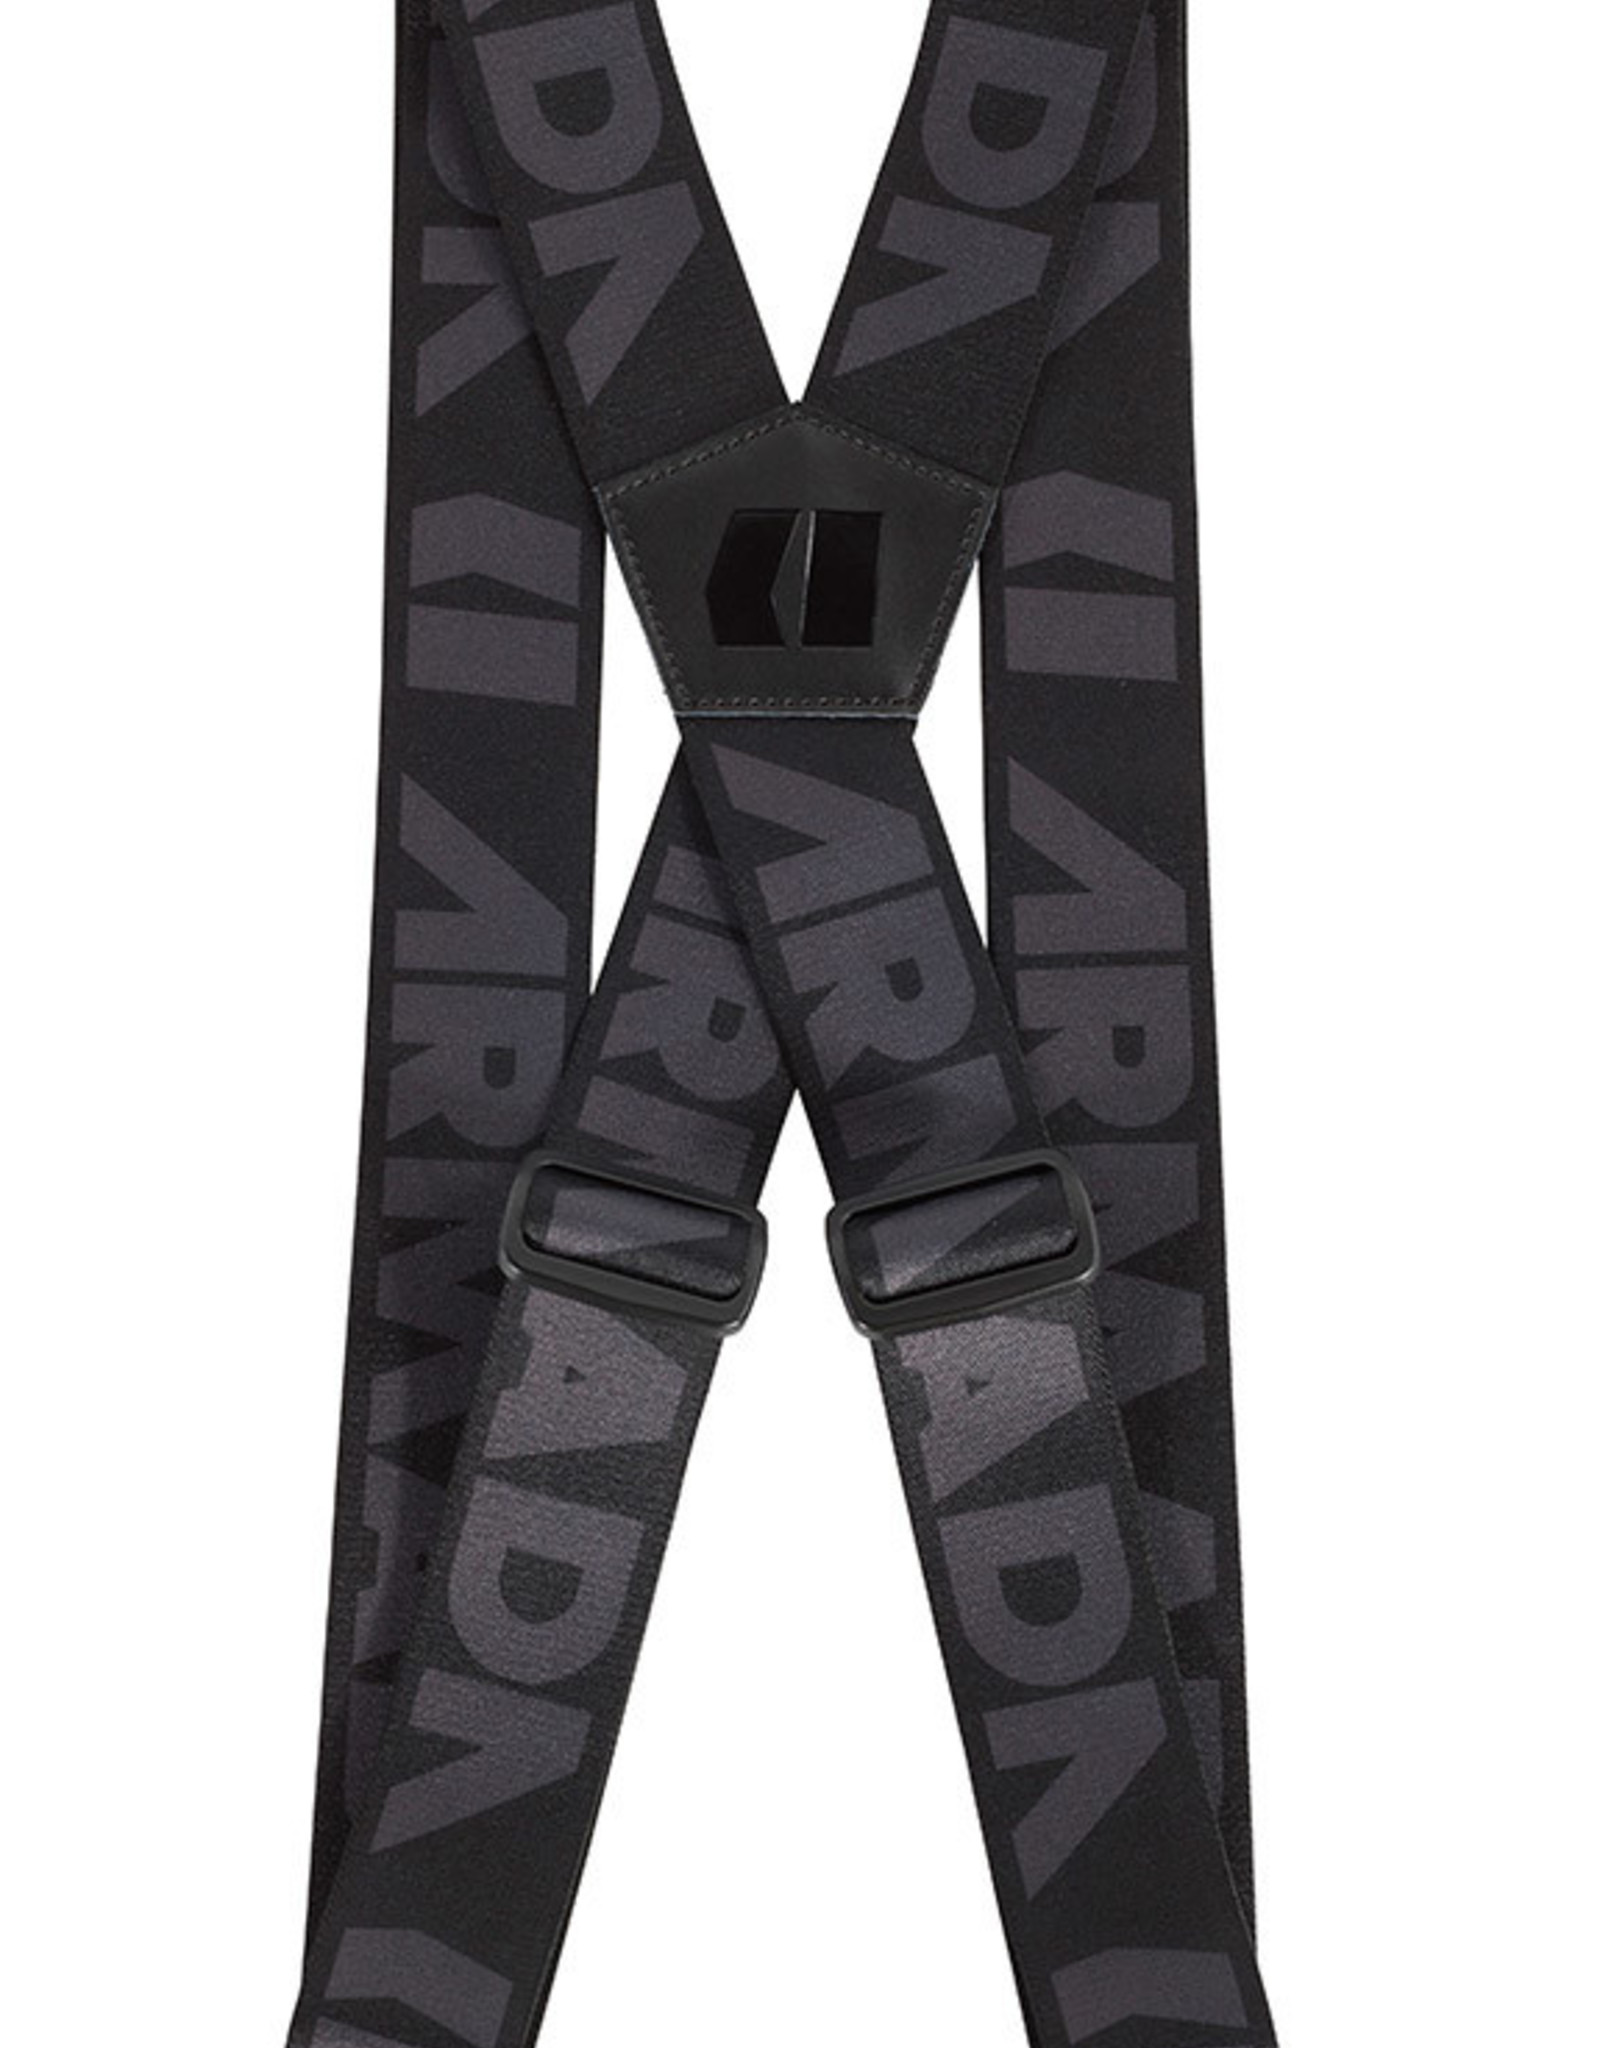 Armada Armada - STAGE Suspenders - Black